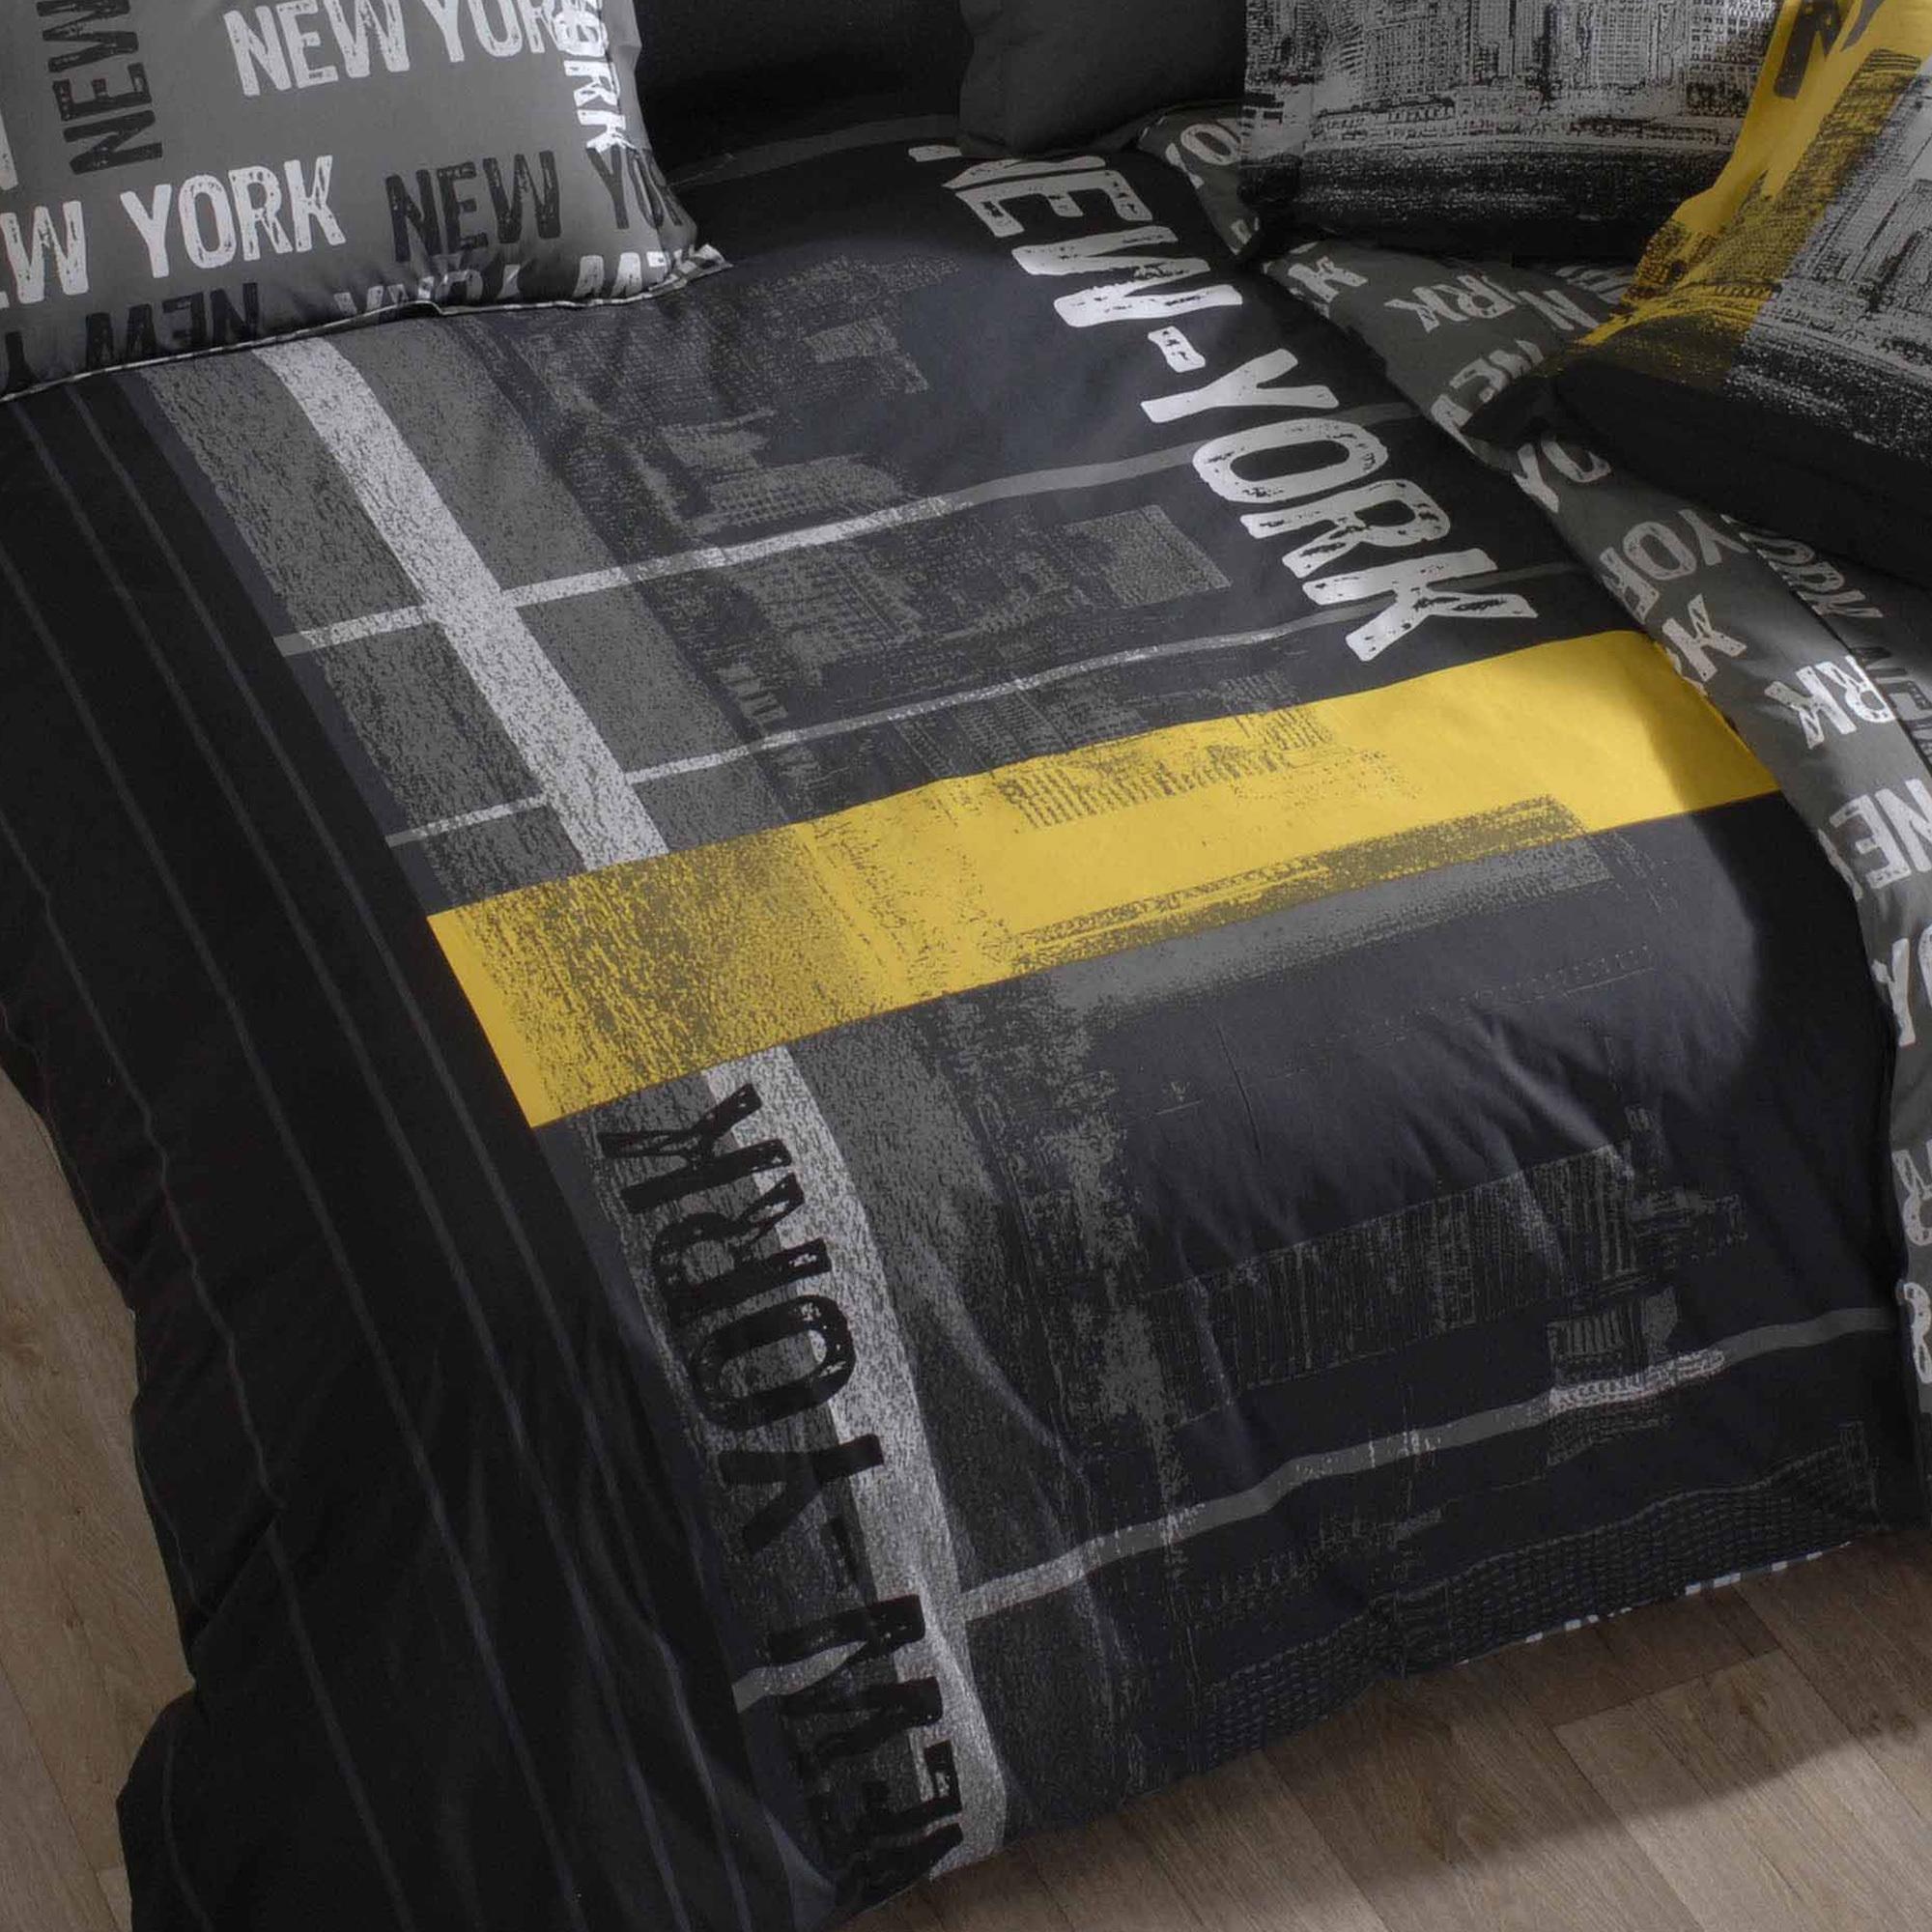 parure de lit 140x200 100 coton new york ebay. Black Bedroom Furniture Sets. Home Design Ideas